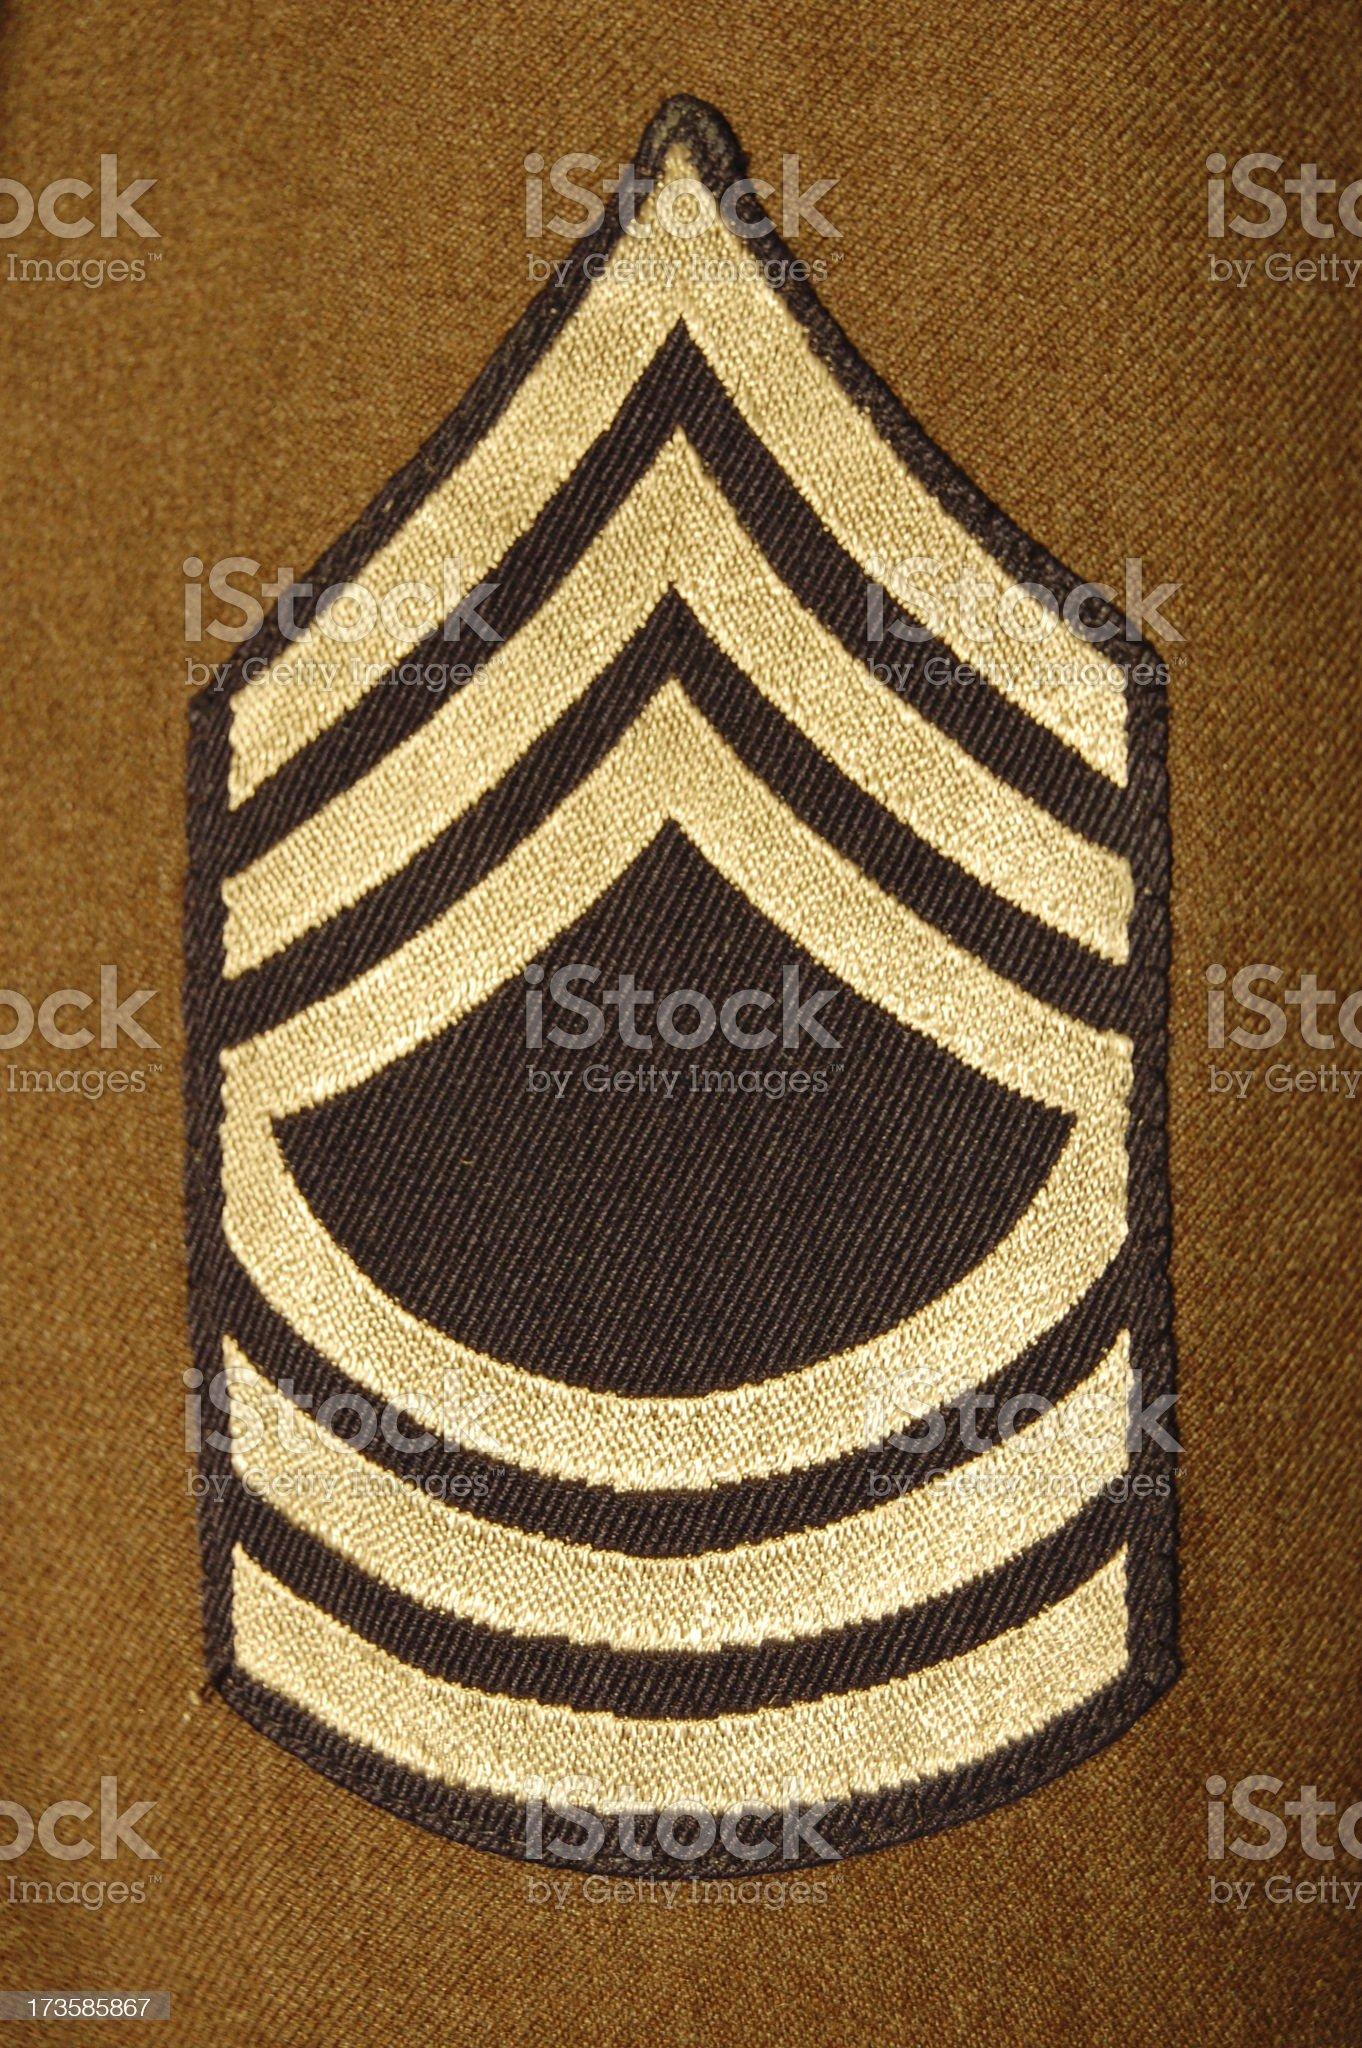 Master Sergeant. royalty-free stock photo